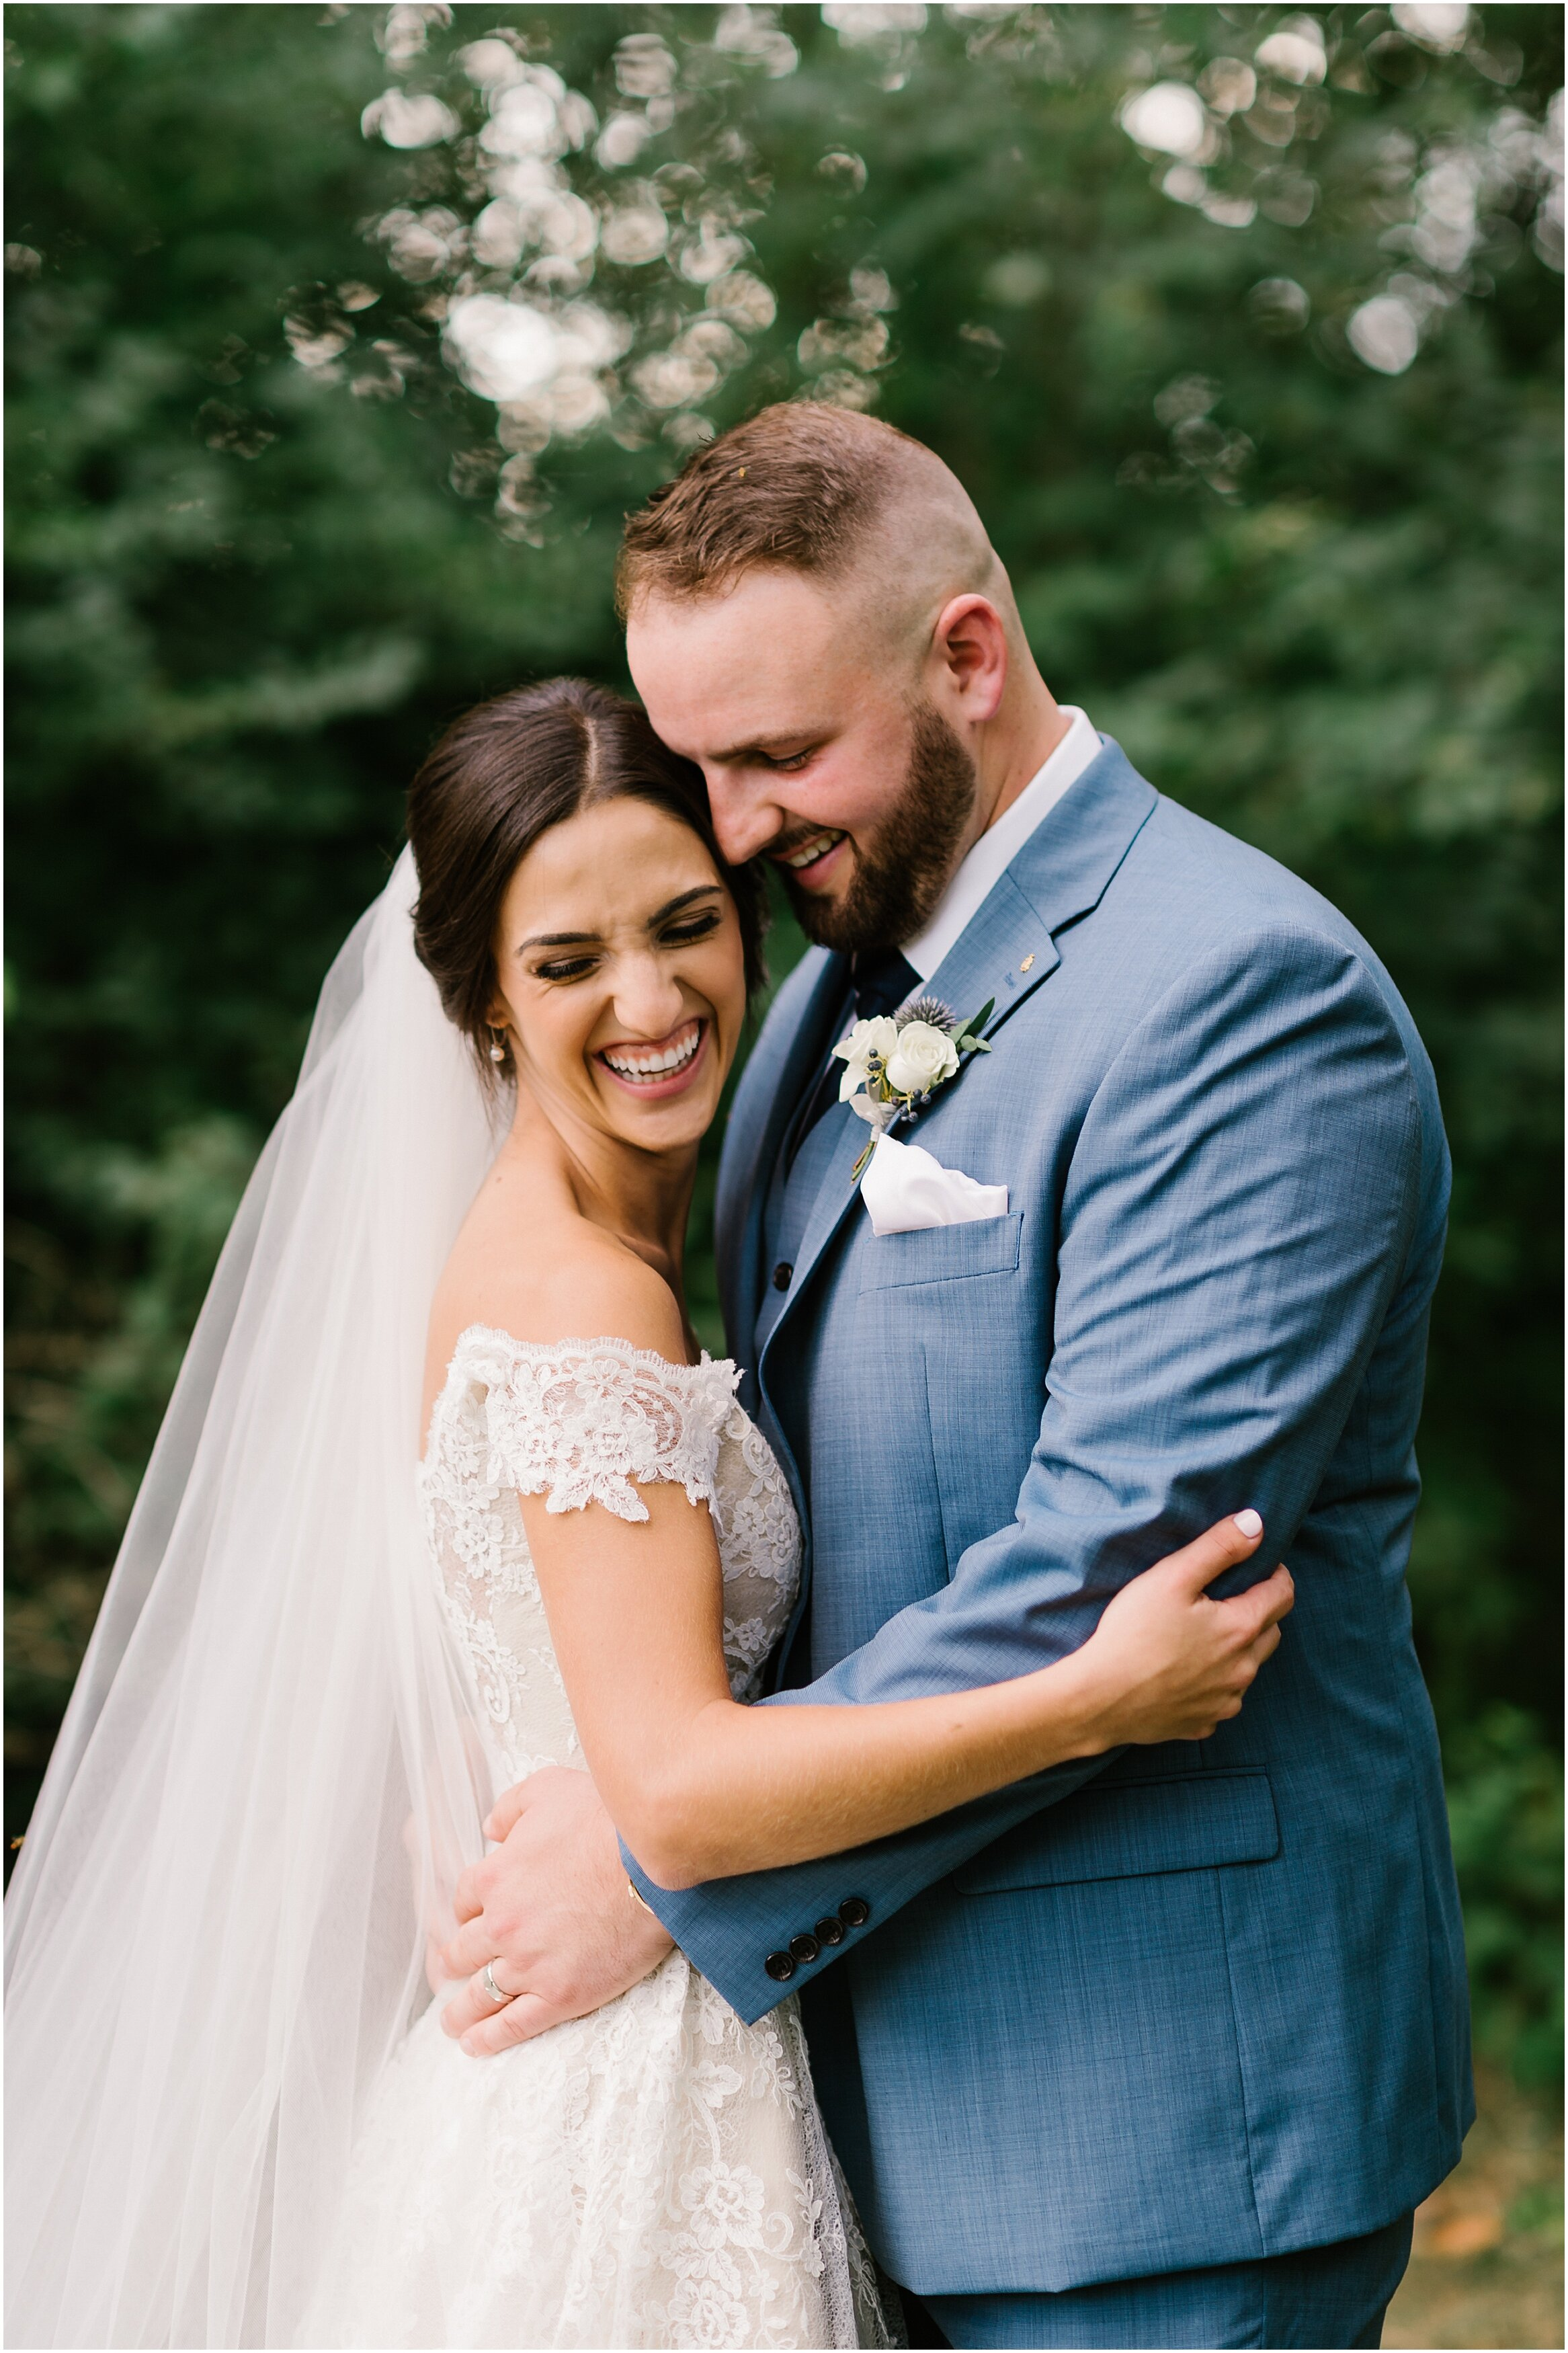 Rebecca Shehorn Photography Indianapolis Wedding Photographer Sycamore at Mallow Run_0756.jpg